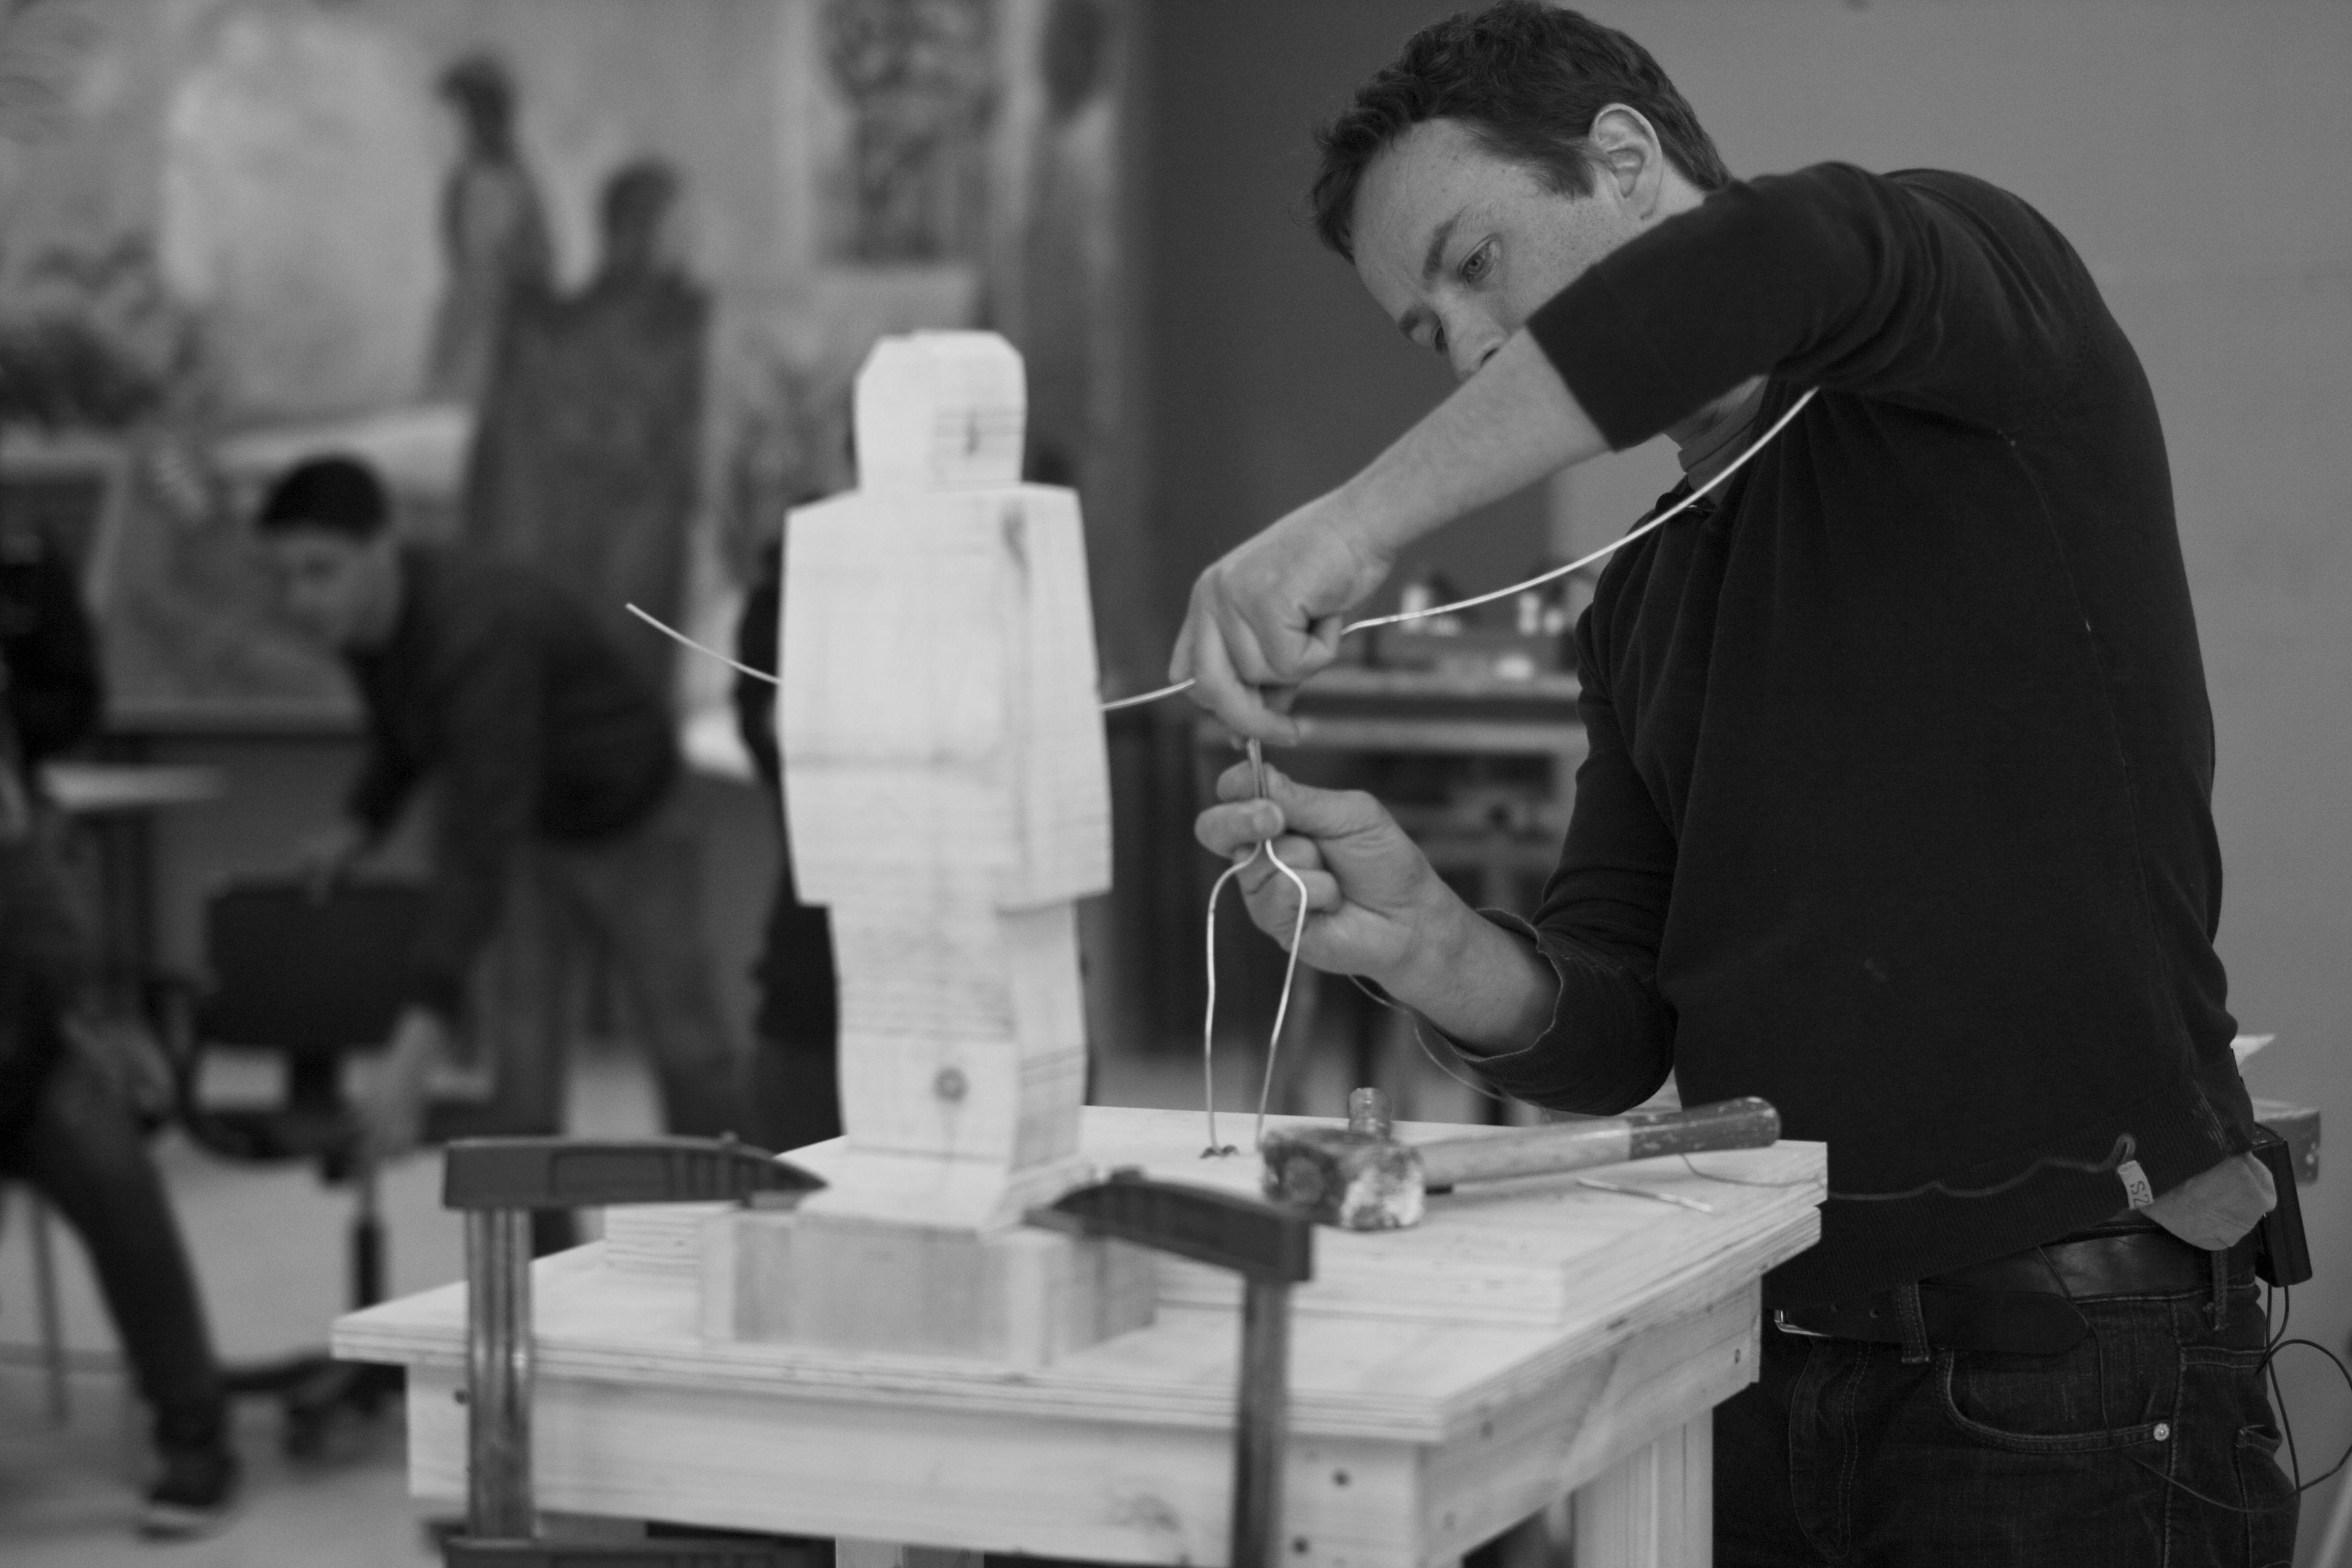 Flickr - Aron Demetz - Dialoghi e materia - Workshop a cura di Franco Reina28